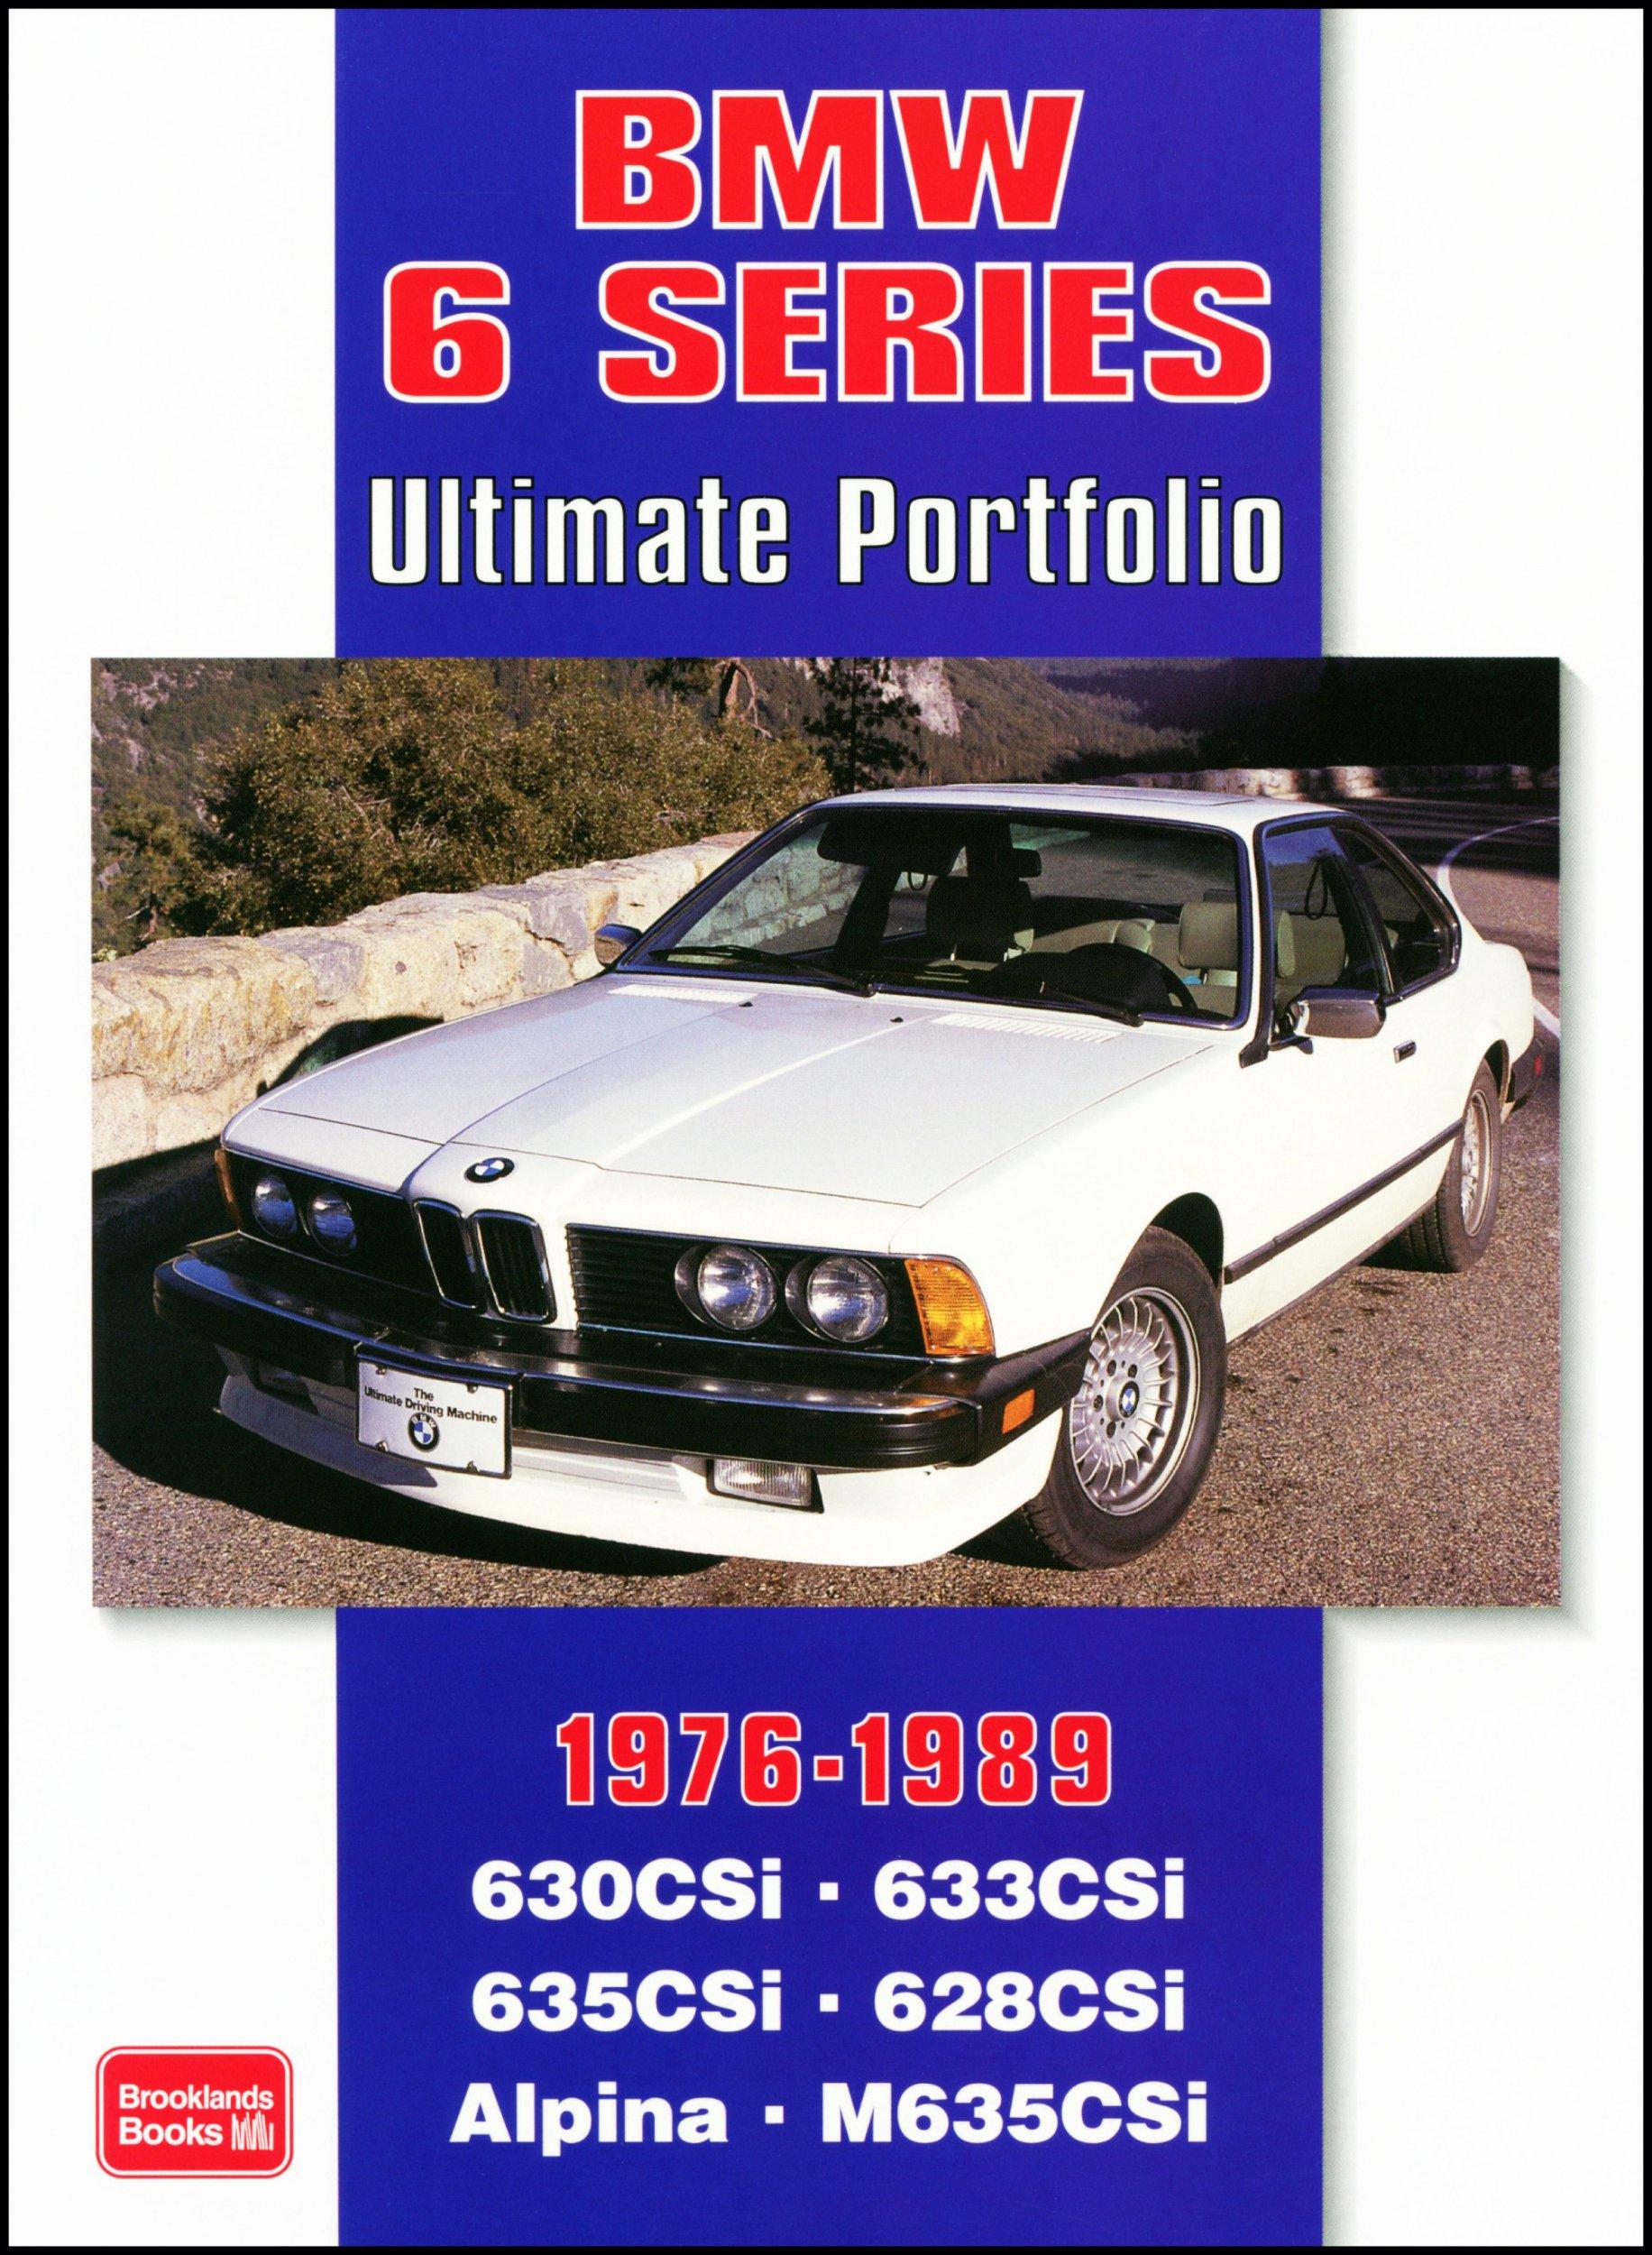 Download BMW 6 Series 1976-1989 -Ultimate Portfolio PDF